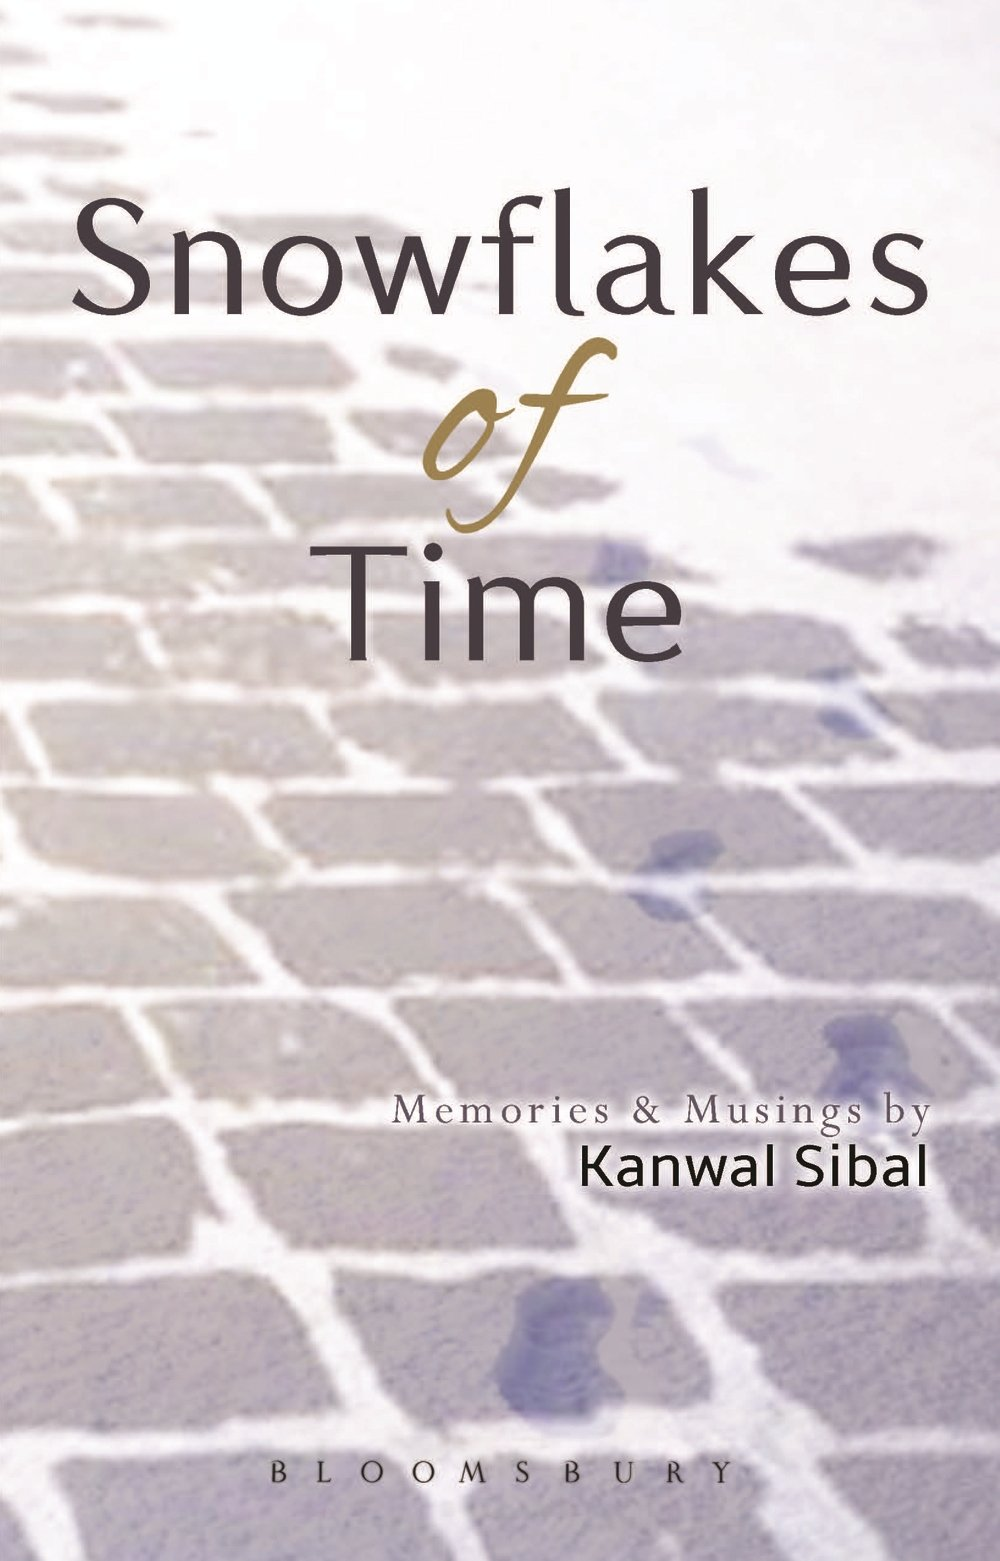 Snowflakes of Time, Memories and Musings. Credit: Bloomsbury Publishing